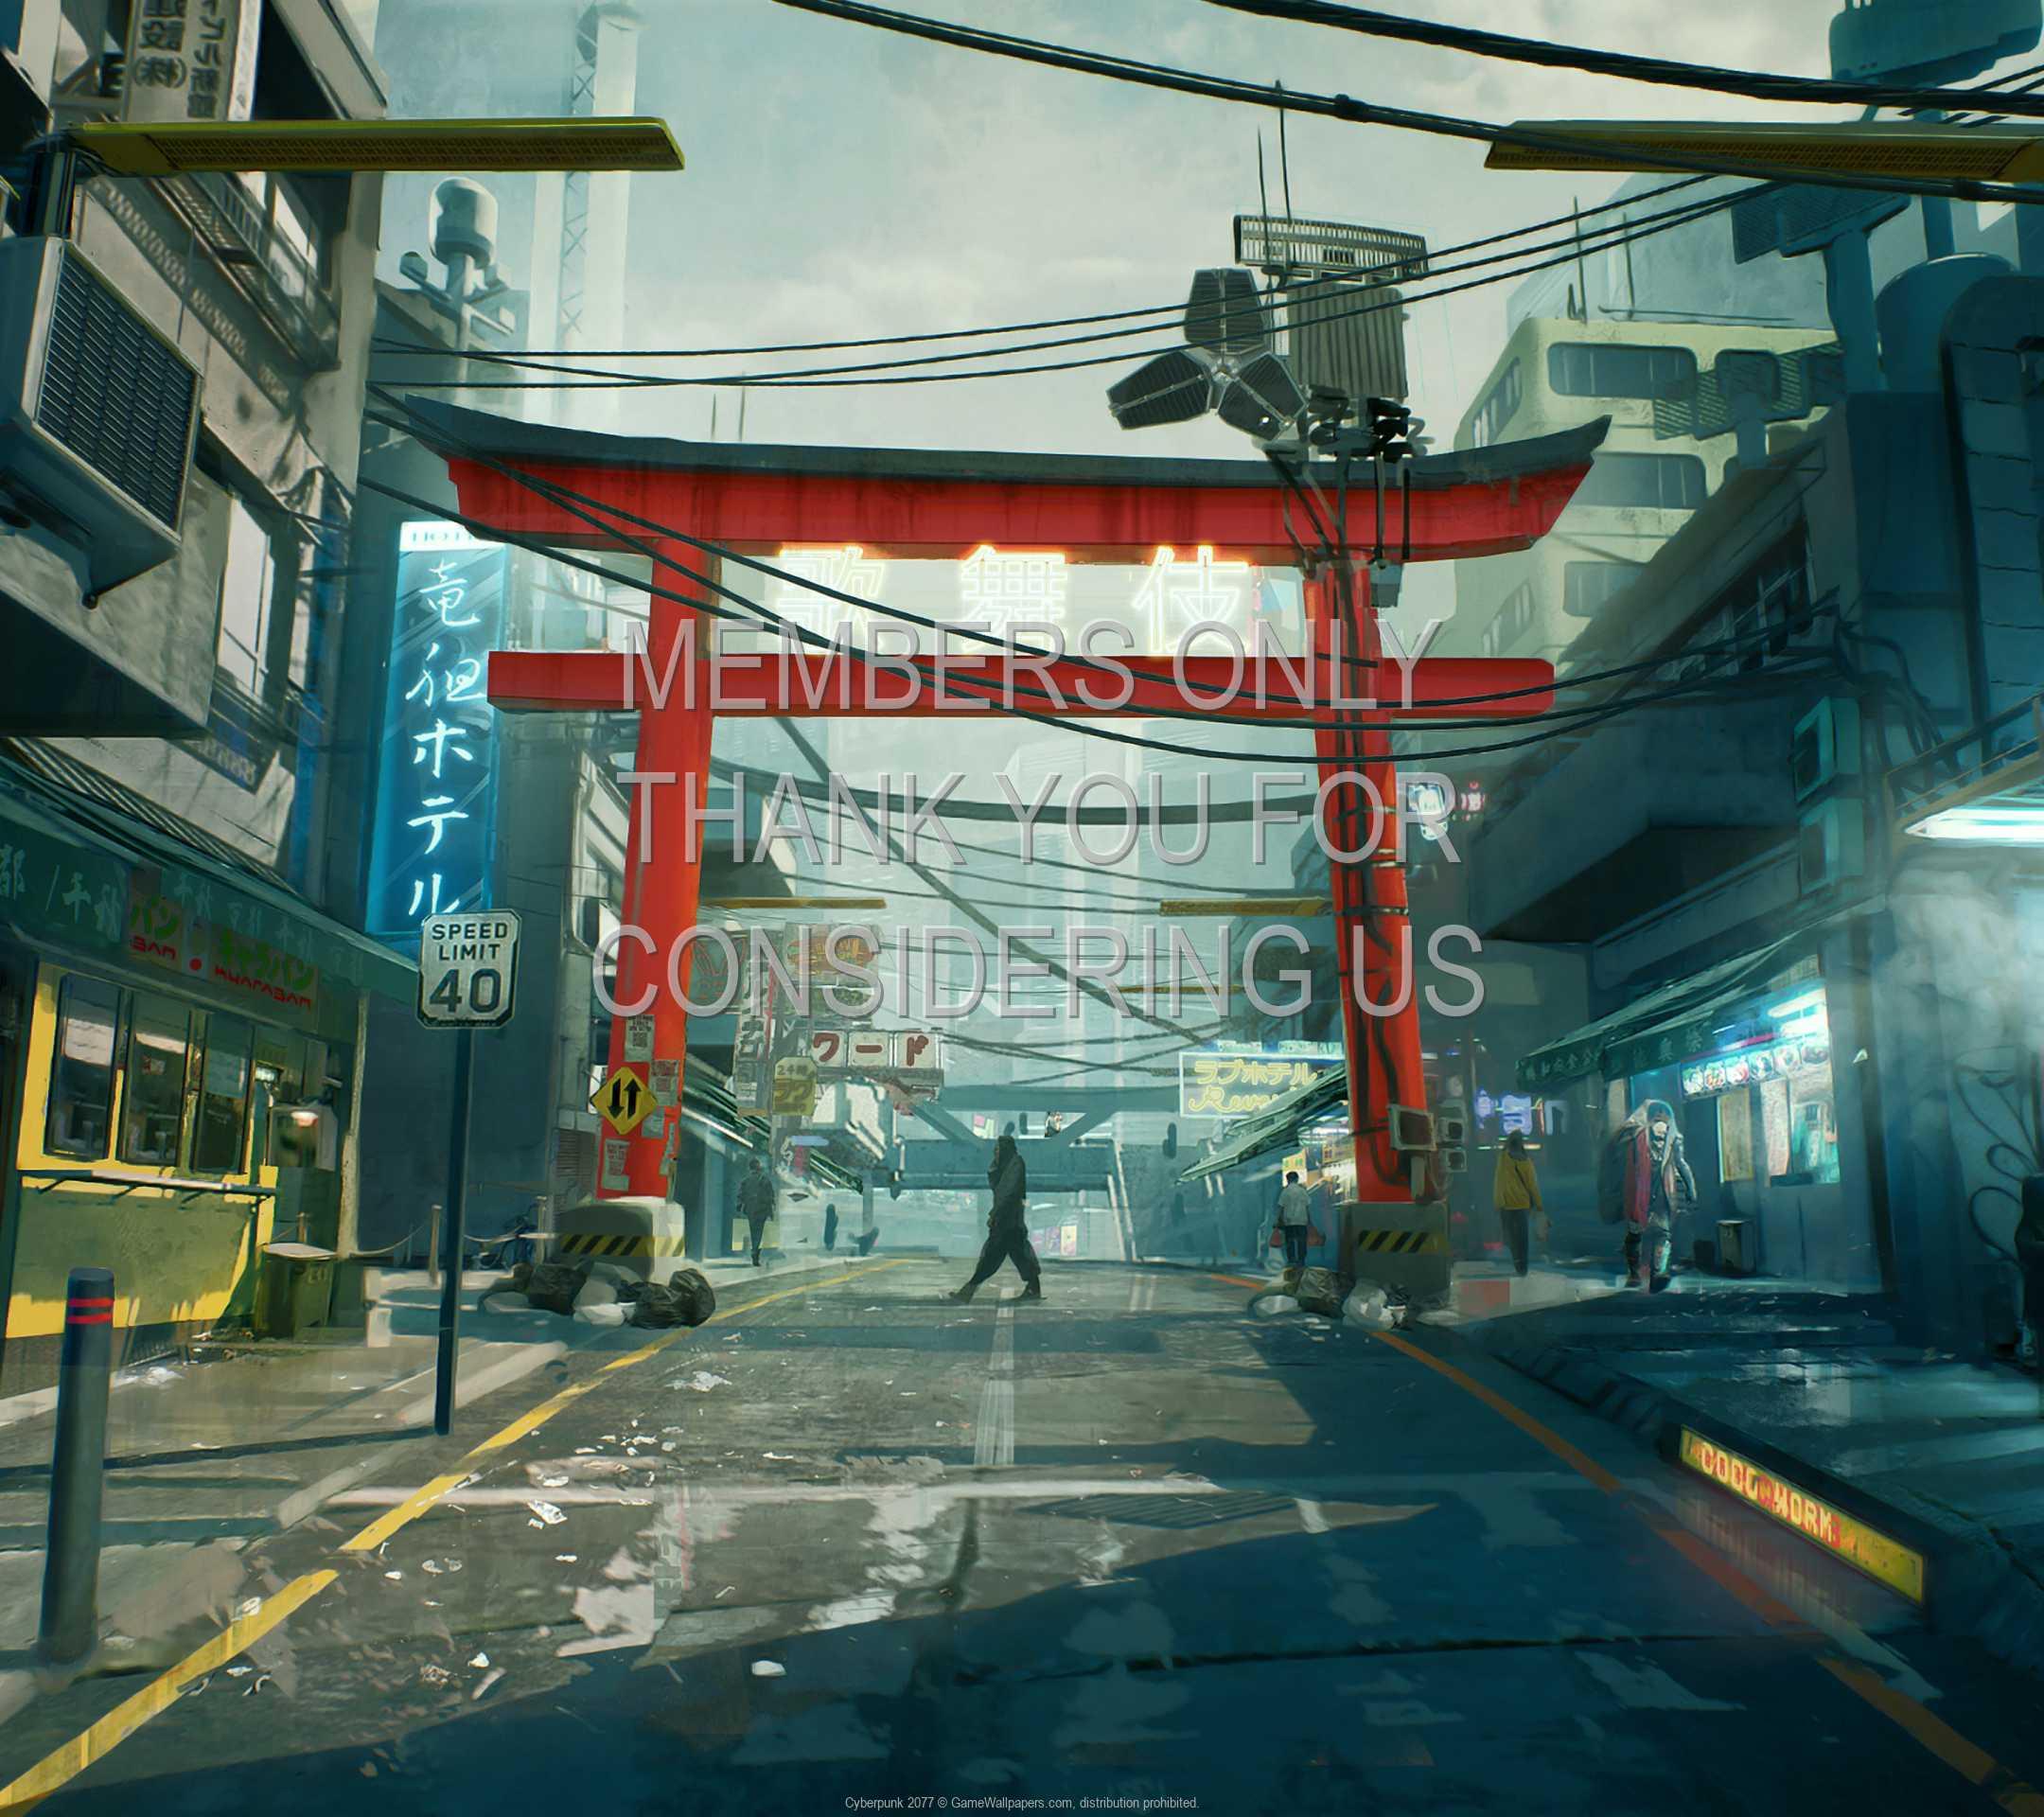 Cyberpunk 2077 1080p Horizontal Mobile wallpaper or background 52